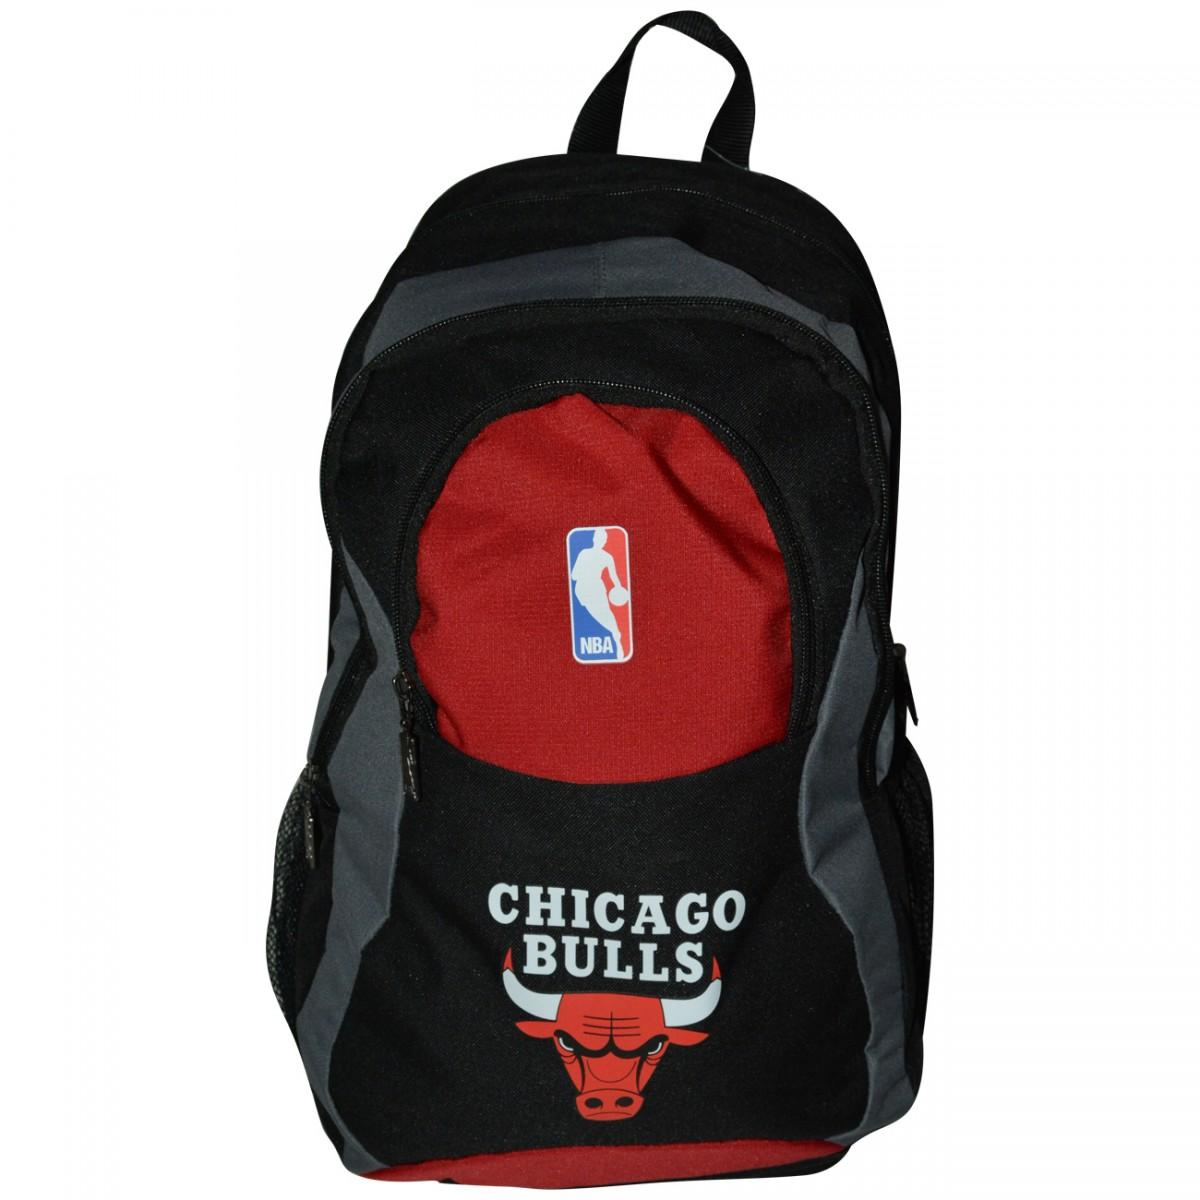 Mochila Chicago Chicago Bulls Mochila Chicago Nba Nba Mochila Bulls Nba Bulls Ee2YbDH9WI